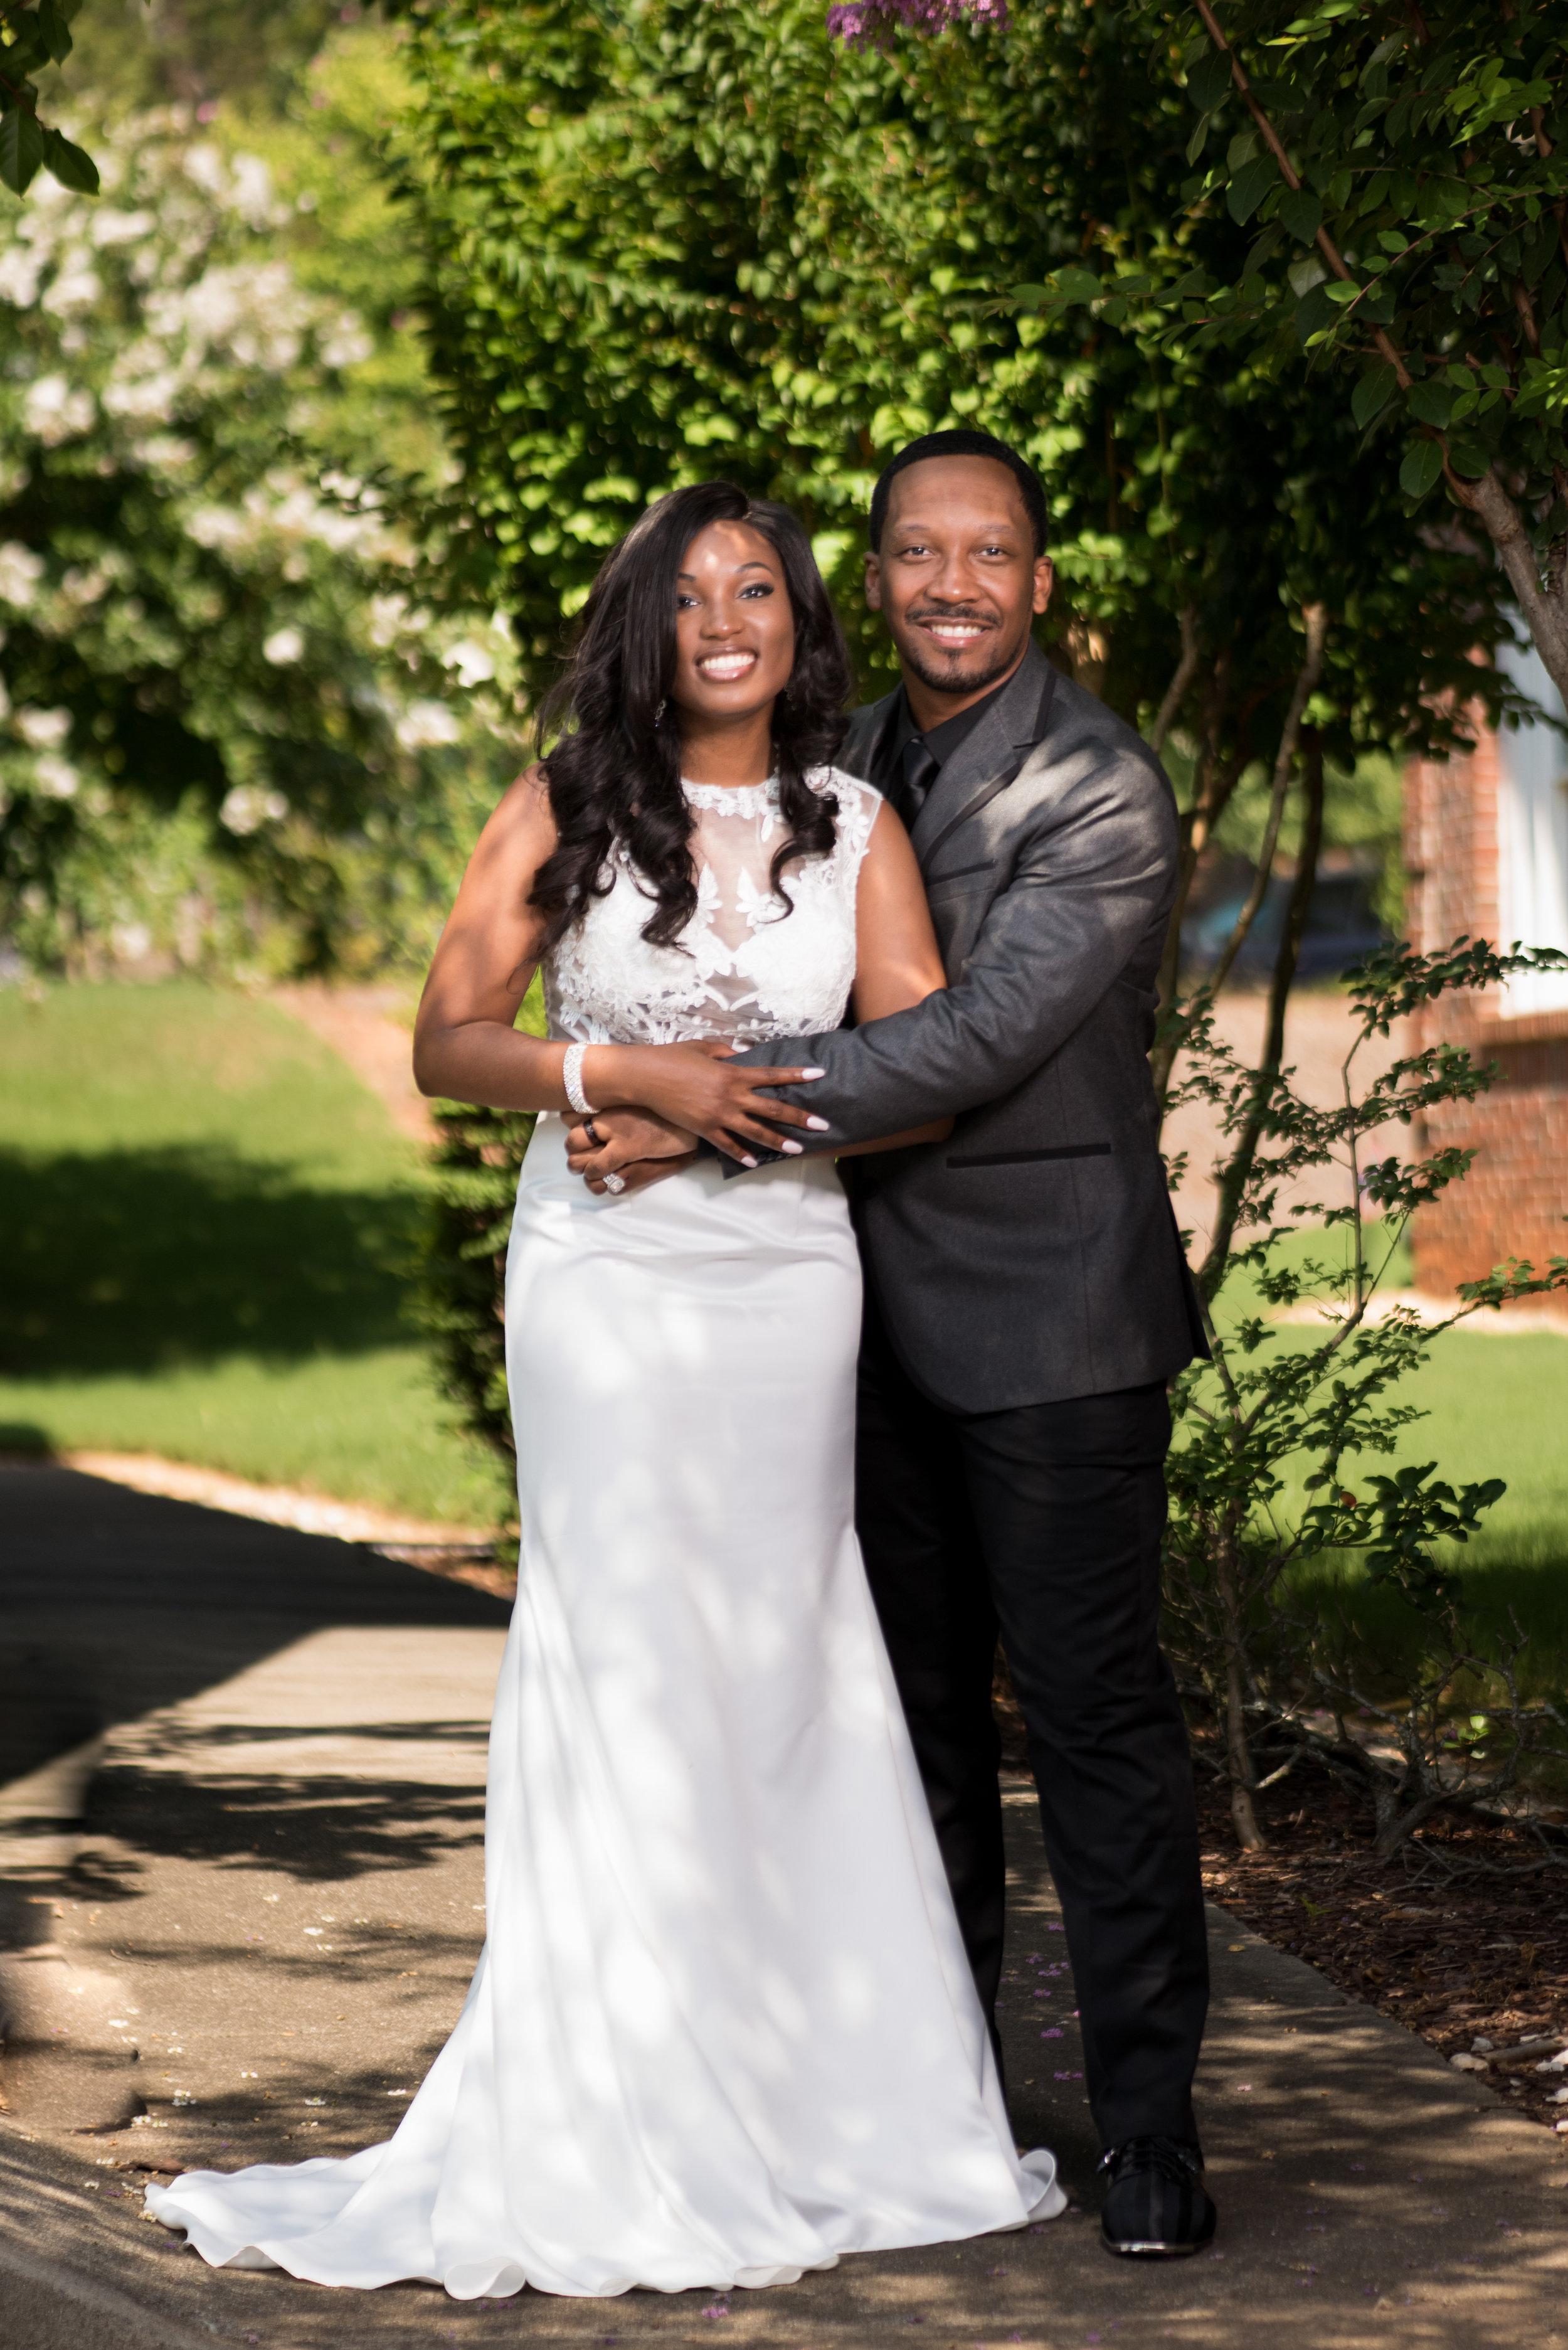 Latoya+Mike_Leighton-DaCosta-Photographer_Ceremonyuntitled-9517-21.jpg